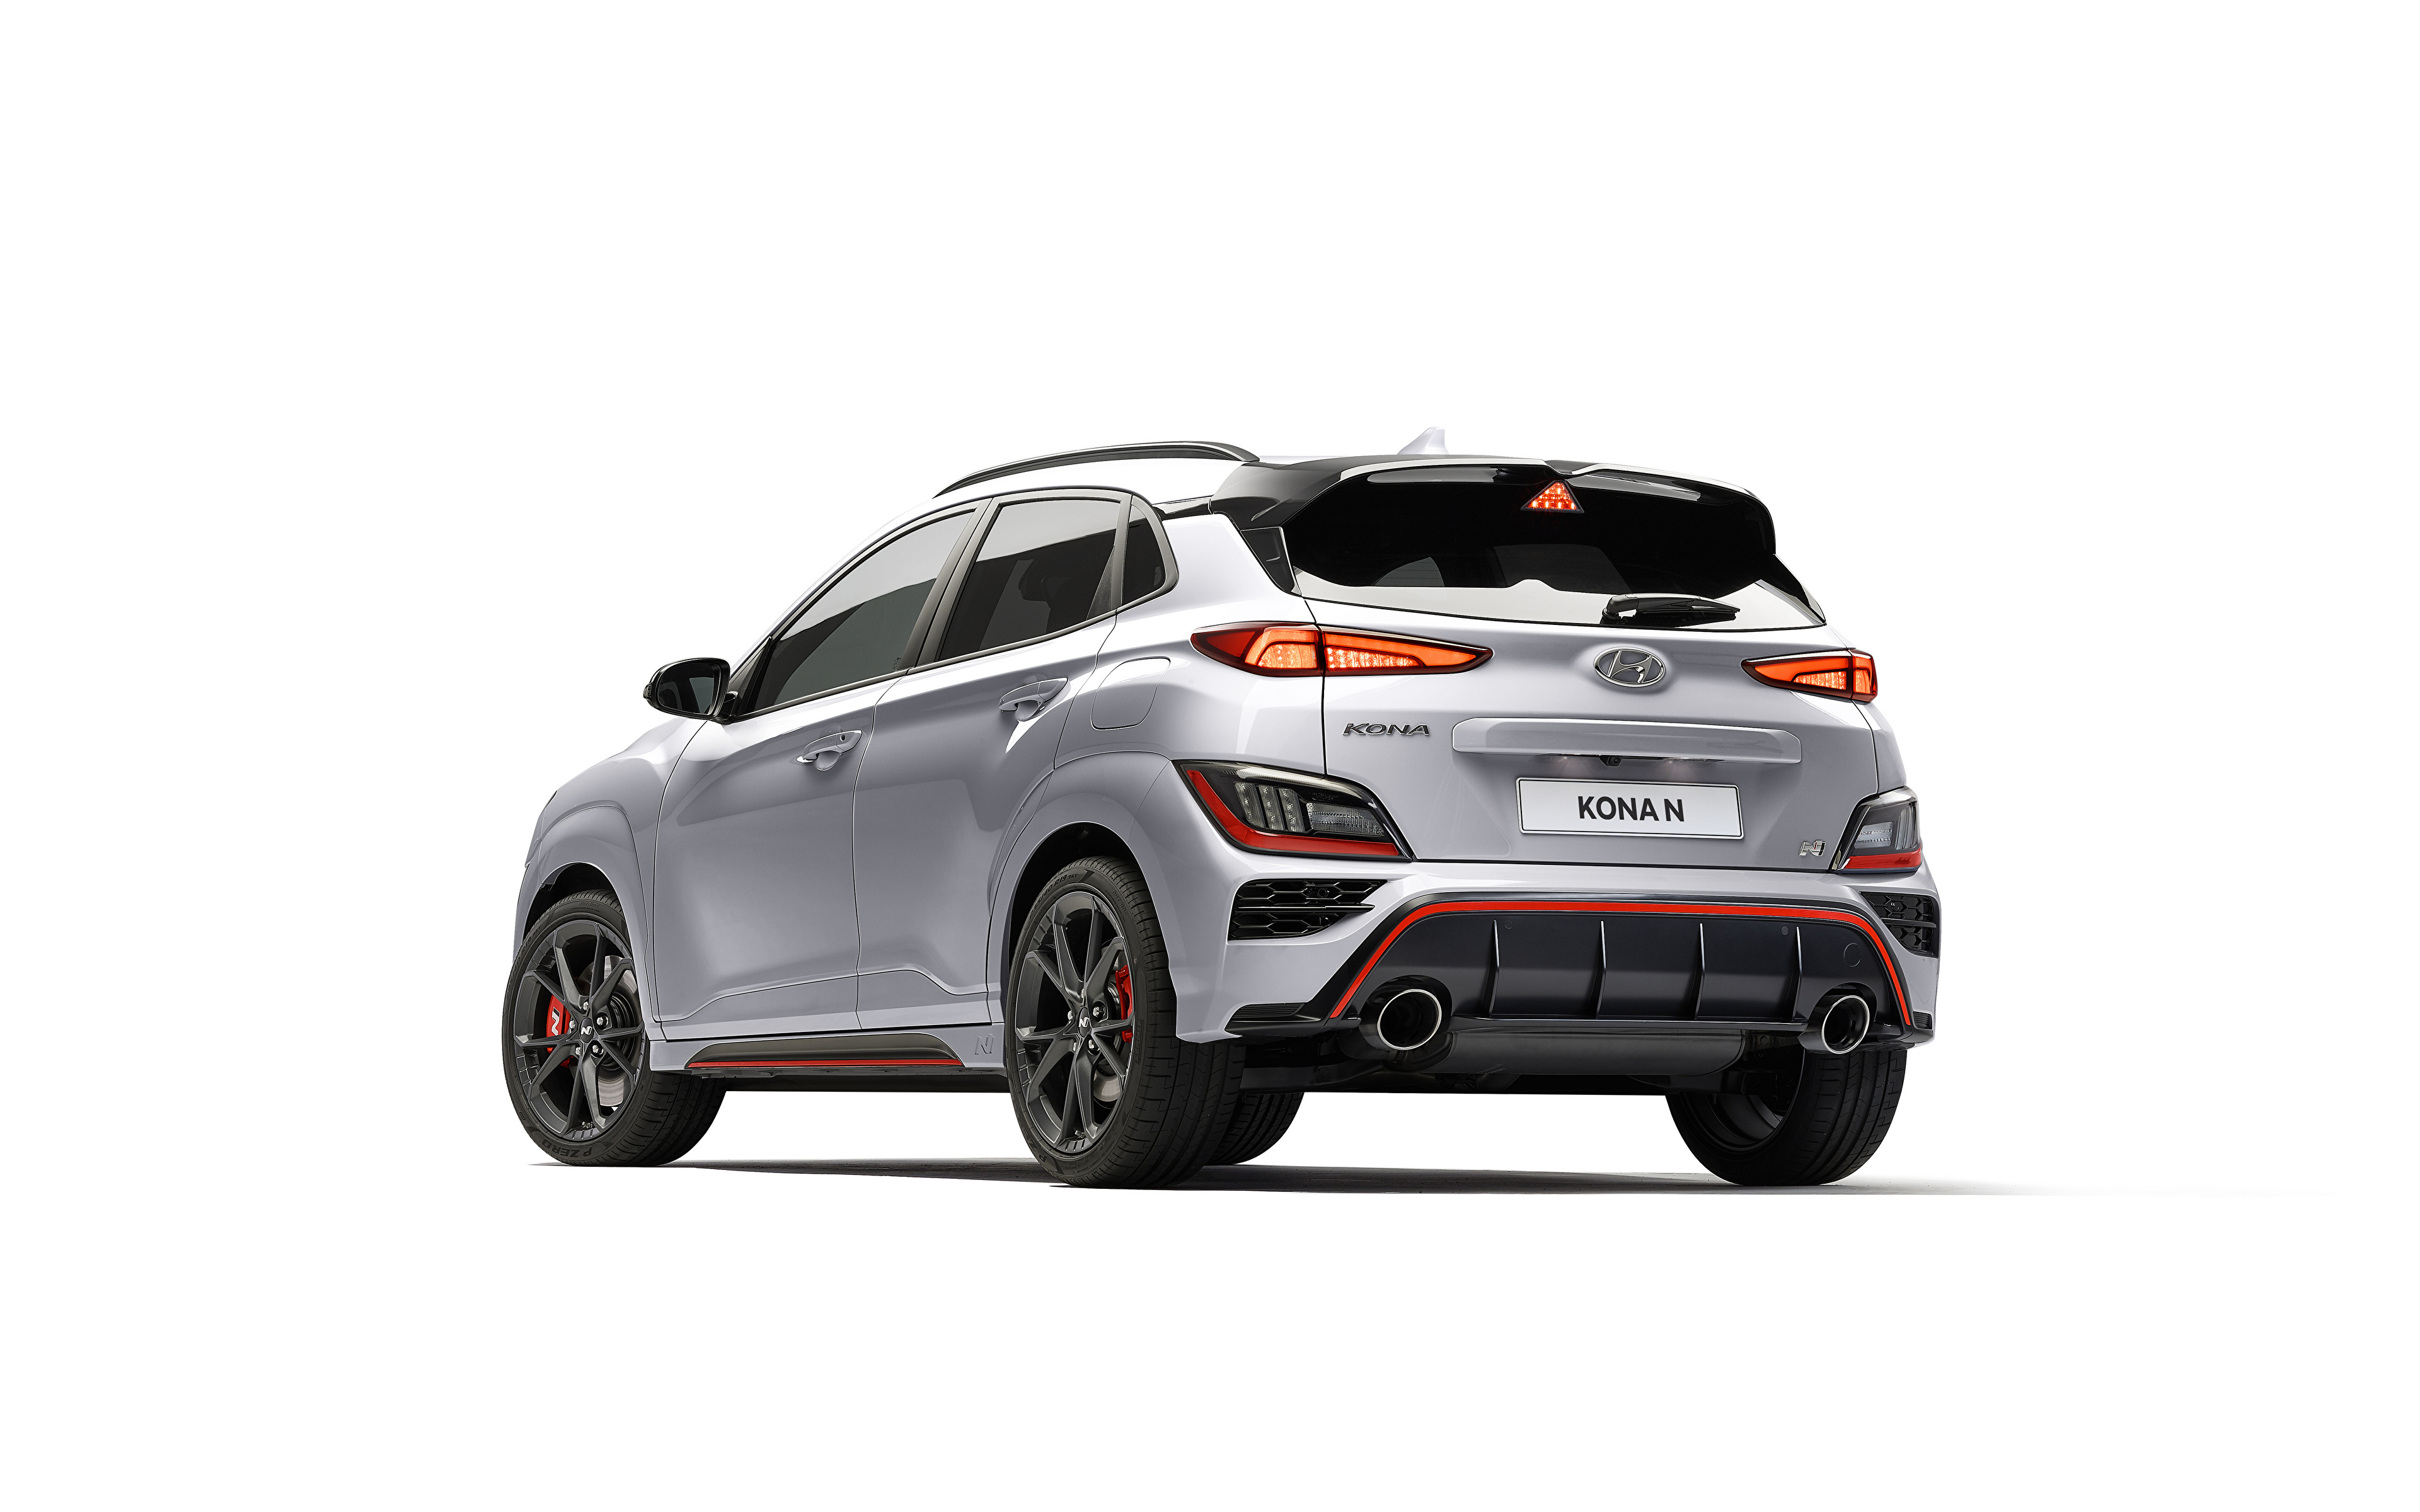 Bilder Hyundai Kona N, (Worldwide), (OS), 2021 Sølv farge Biler Bakfra Metallisk Hvit bakgrunn 3840x2400 bil automobil